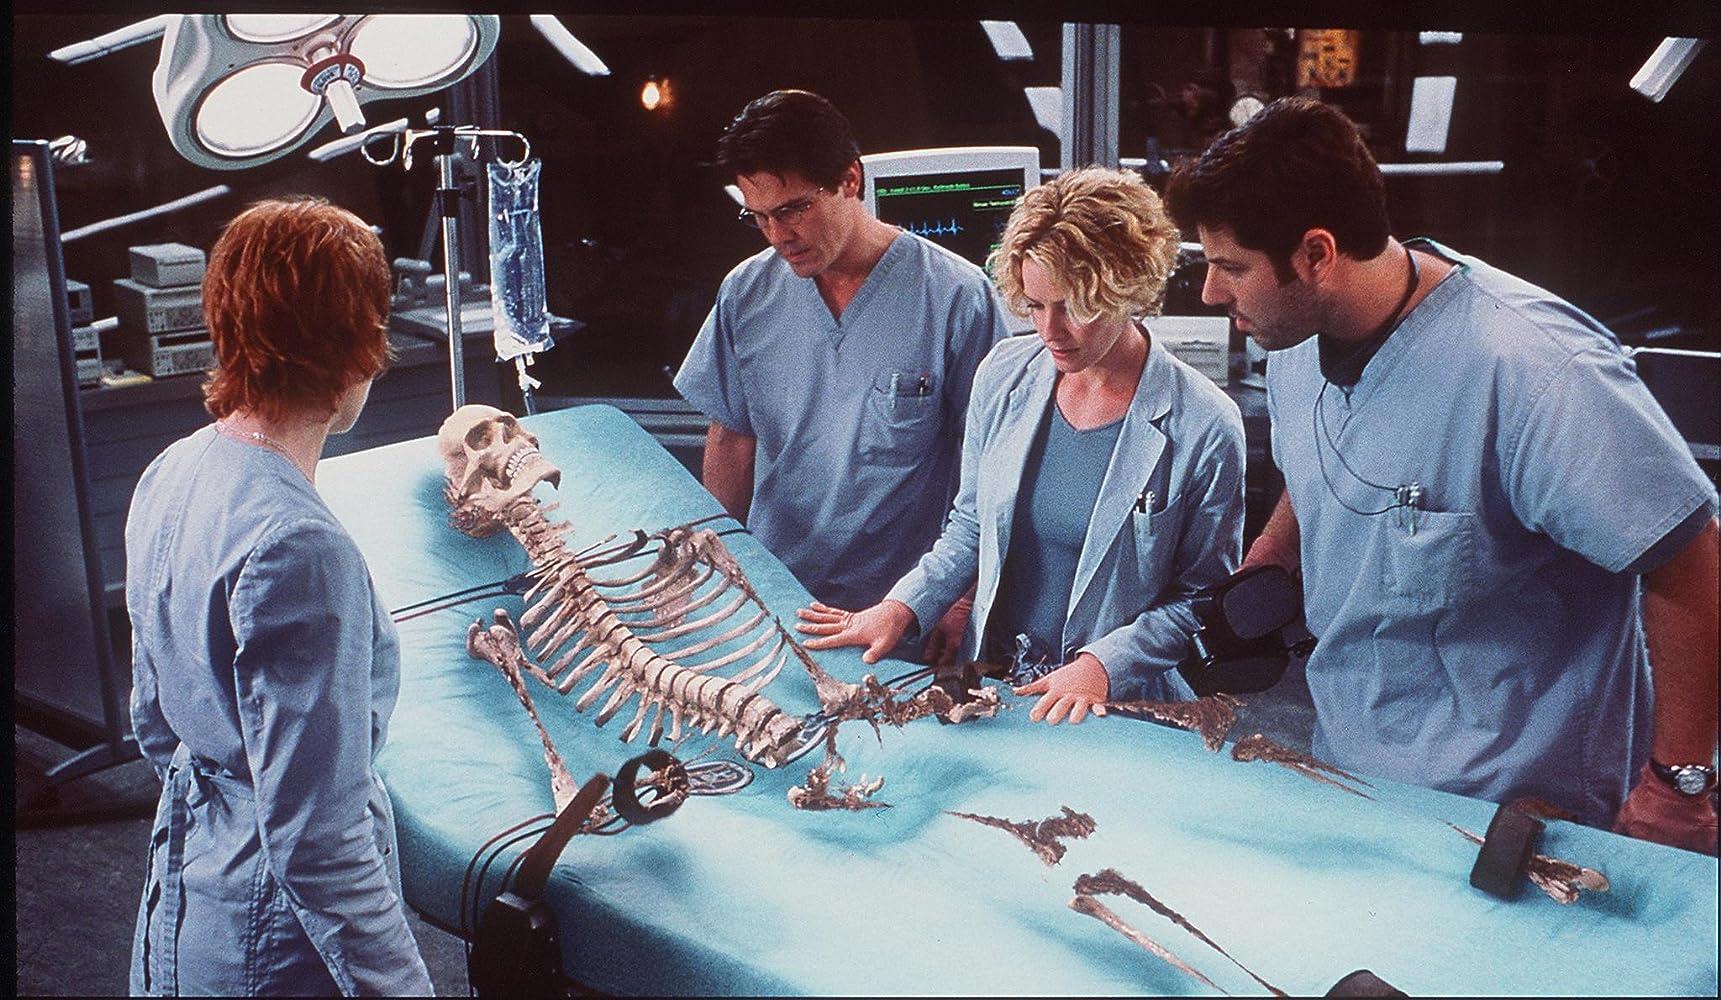 Elisabeth Shue, Josh Brolin, Kim Dickens, and Greg Grunberg in Hollow Man (2000)